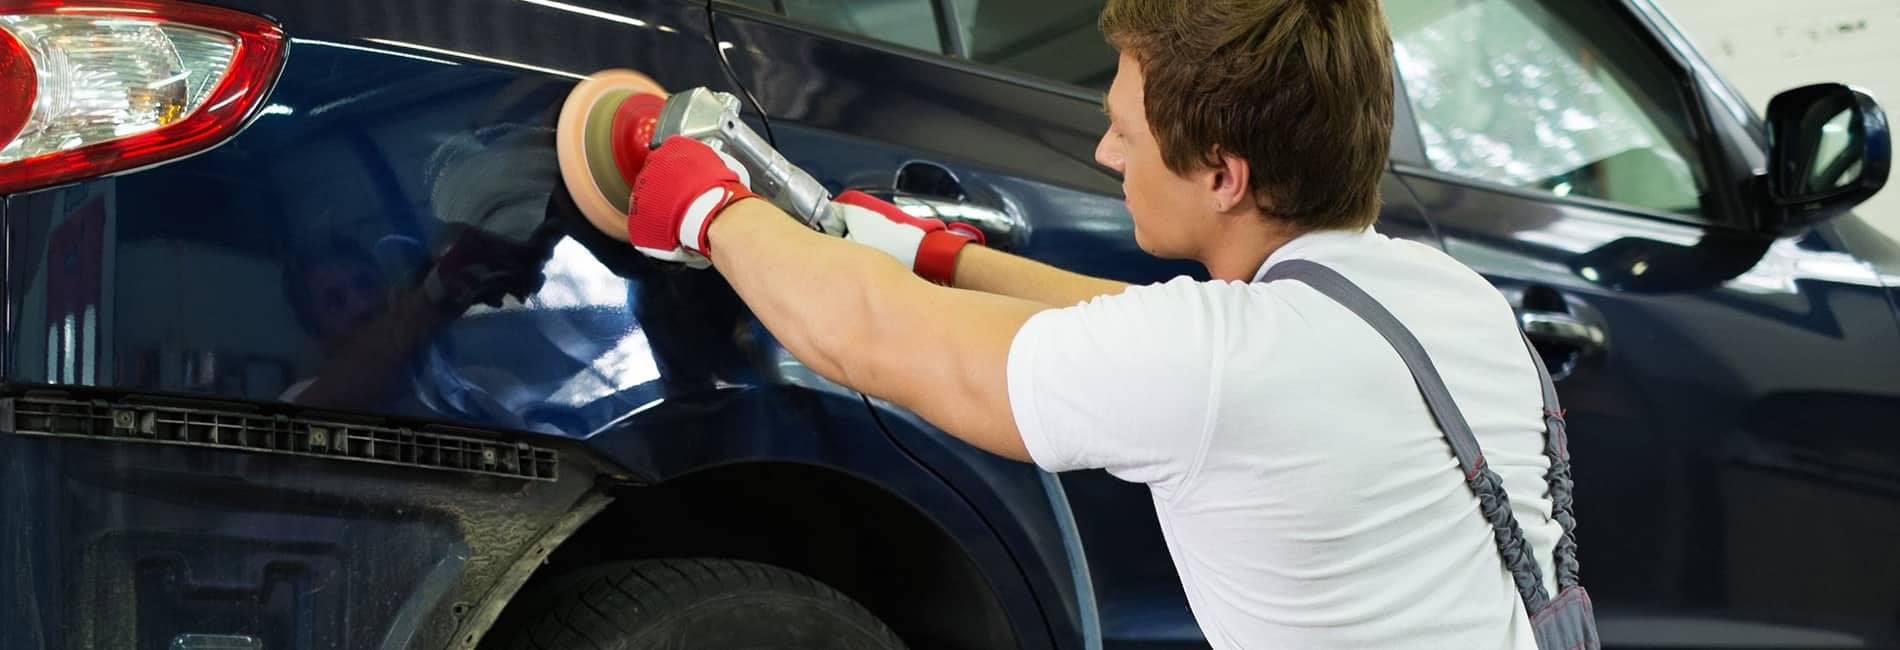 Technician buffing a car